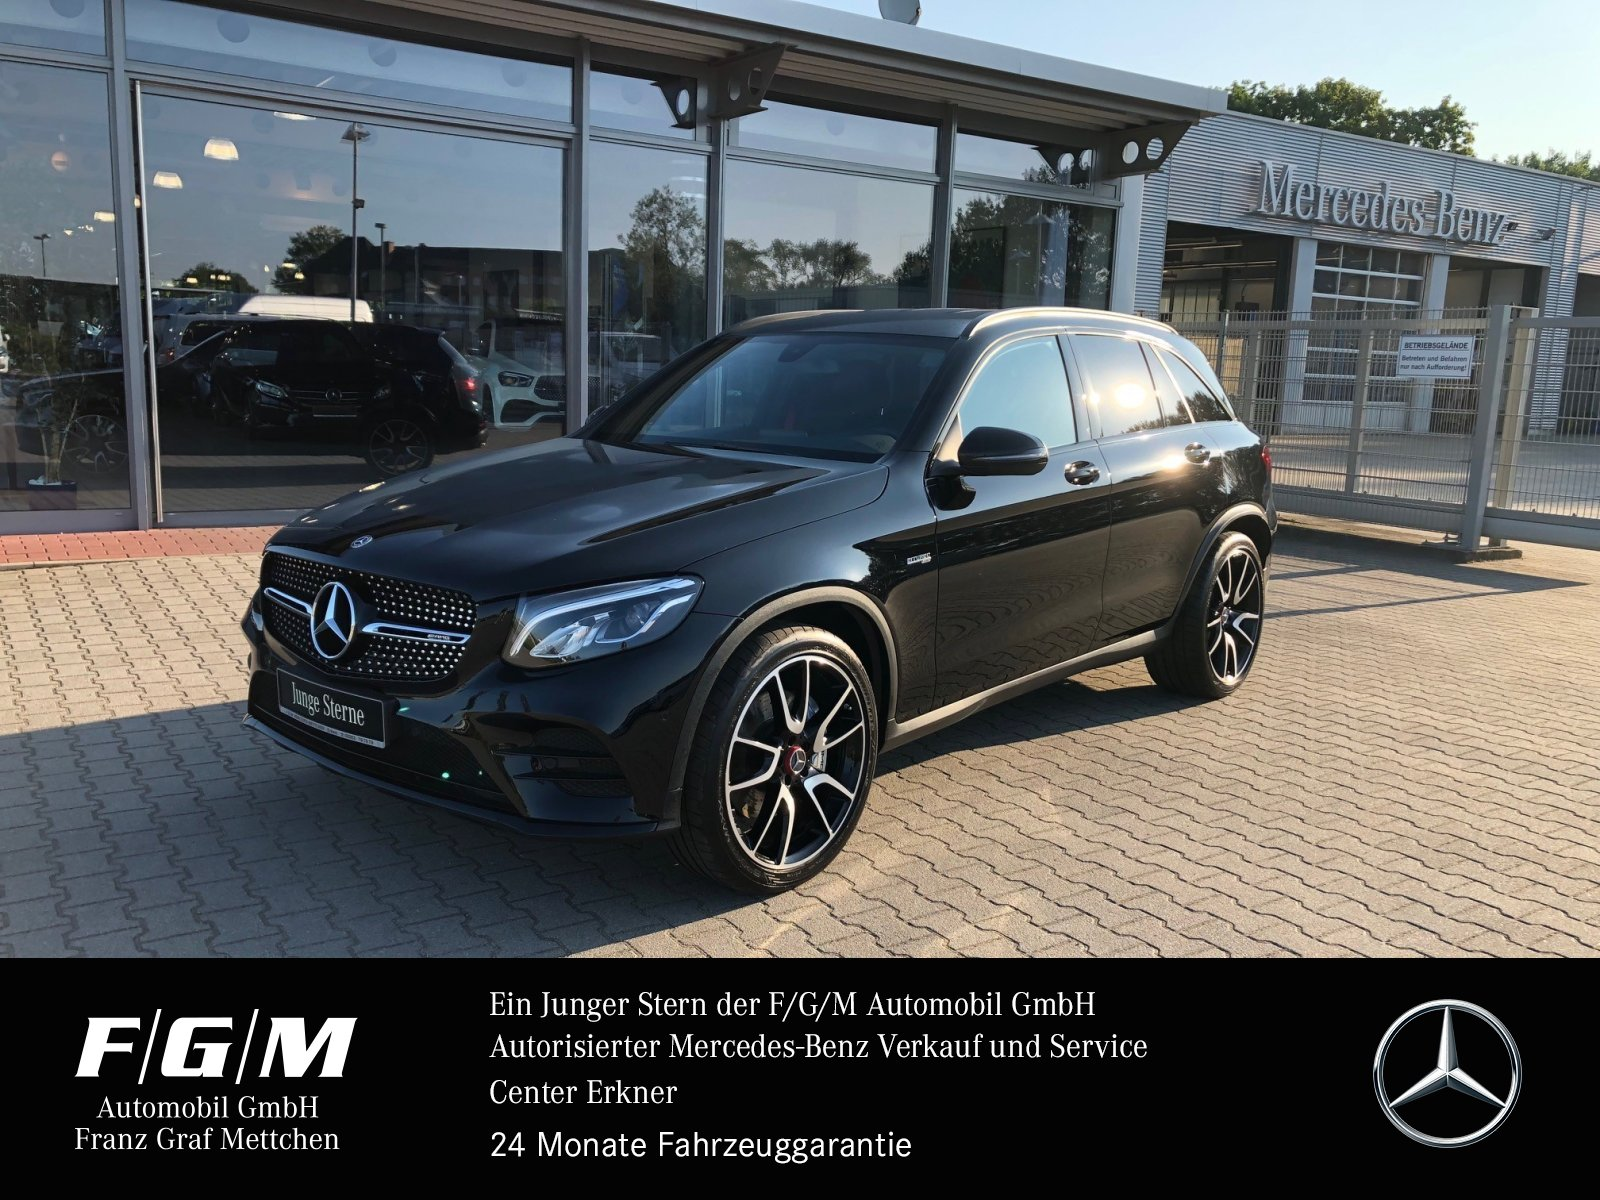 "Mercedes-Benz GLC 43 AMG Navi/LED-Licht/Night/21""/Parktronic, Jahr 2019, petrol"